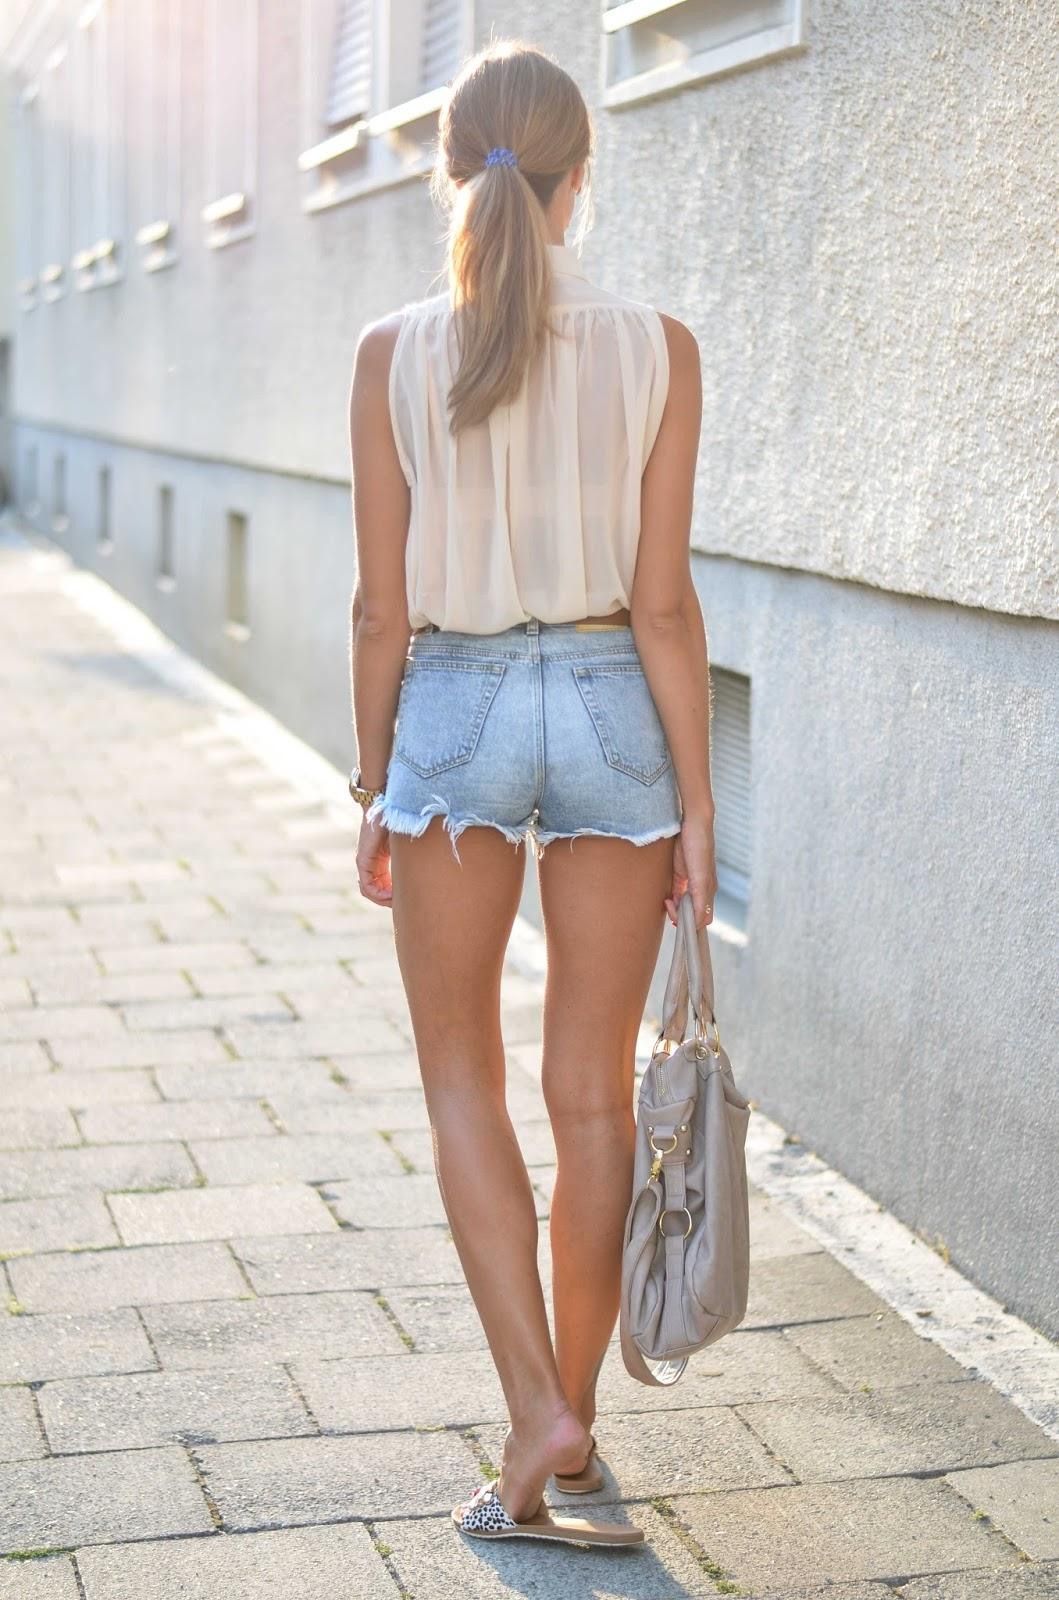 kristjaana mere zara denim shorts sheer beige top summer fashion outfit